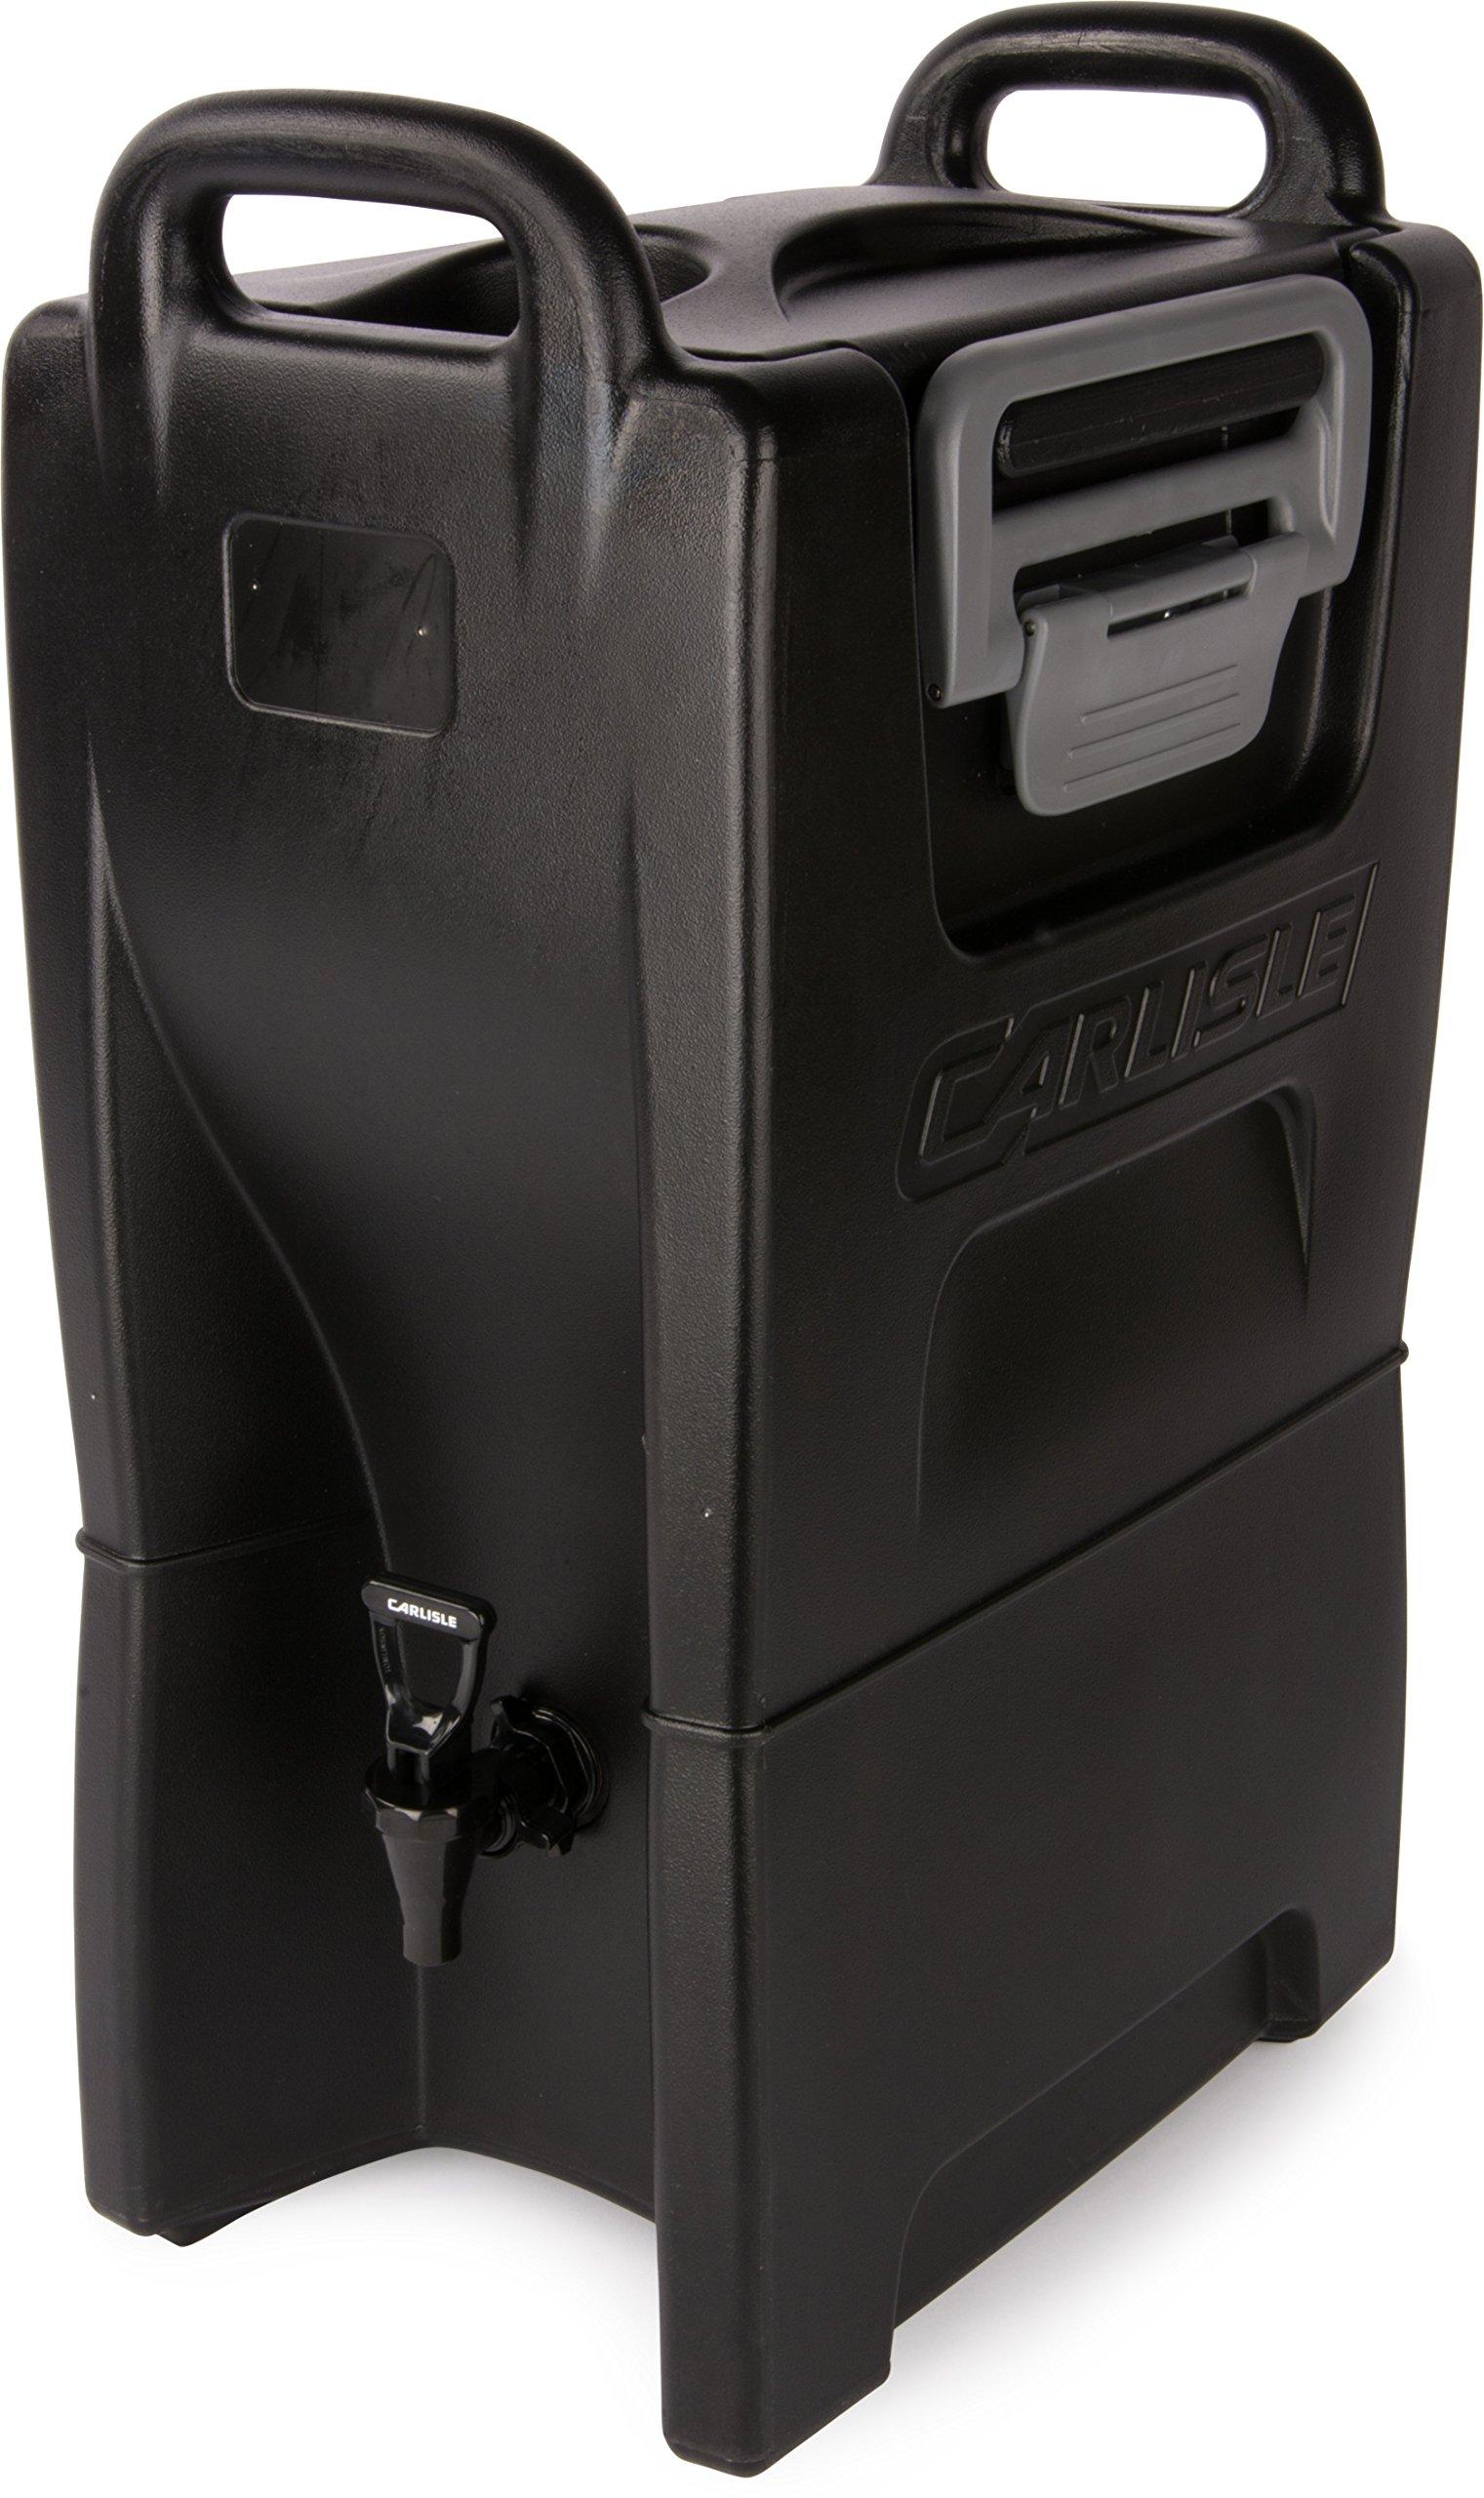 Carlisle IT50003 Cateraide IT Insulated Beverage Server / Dispenser, 5 Gallon, Onyx